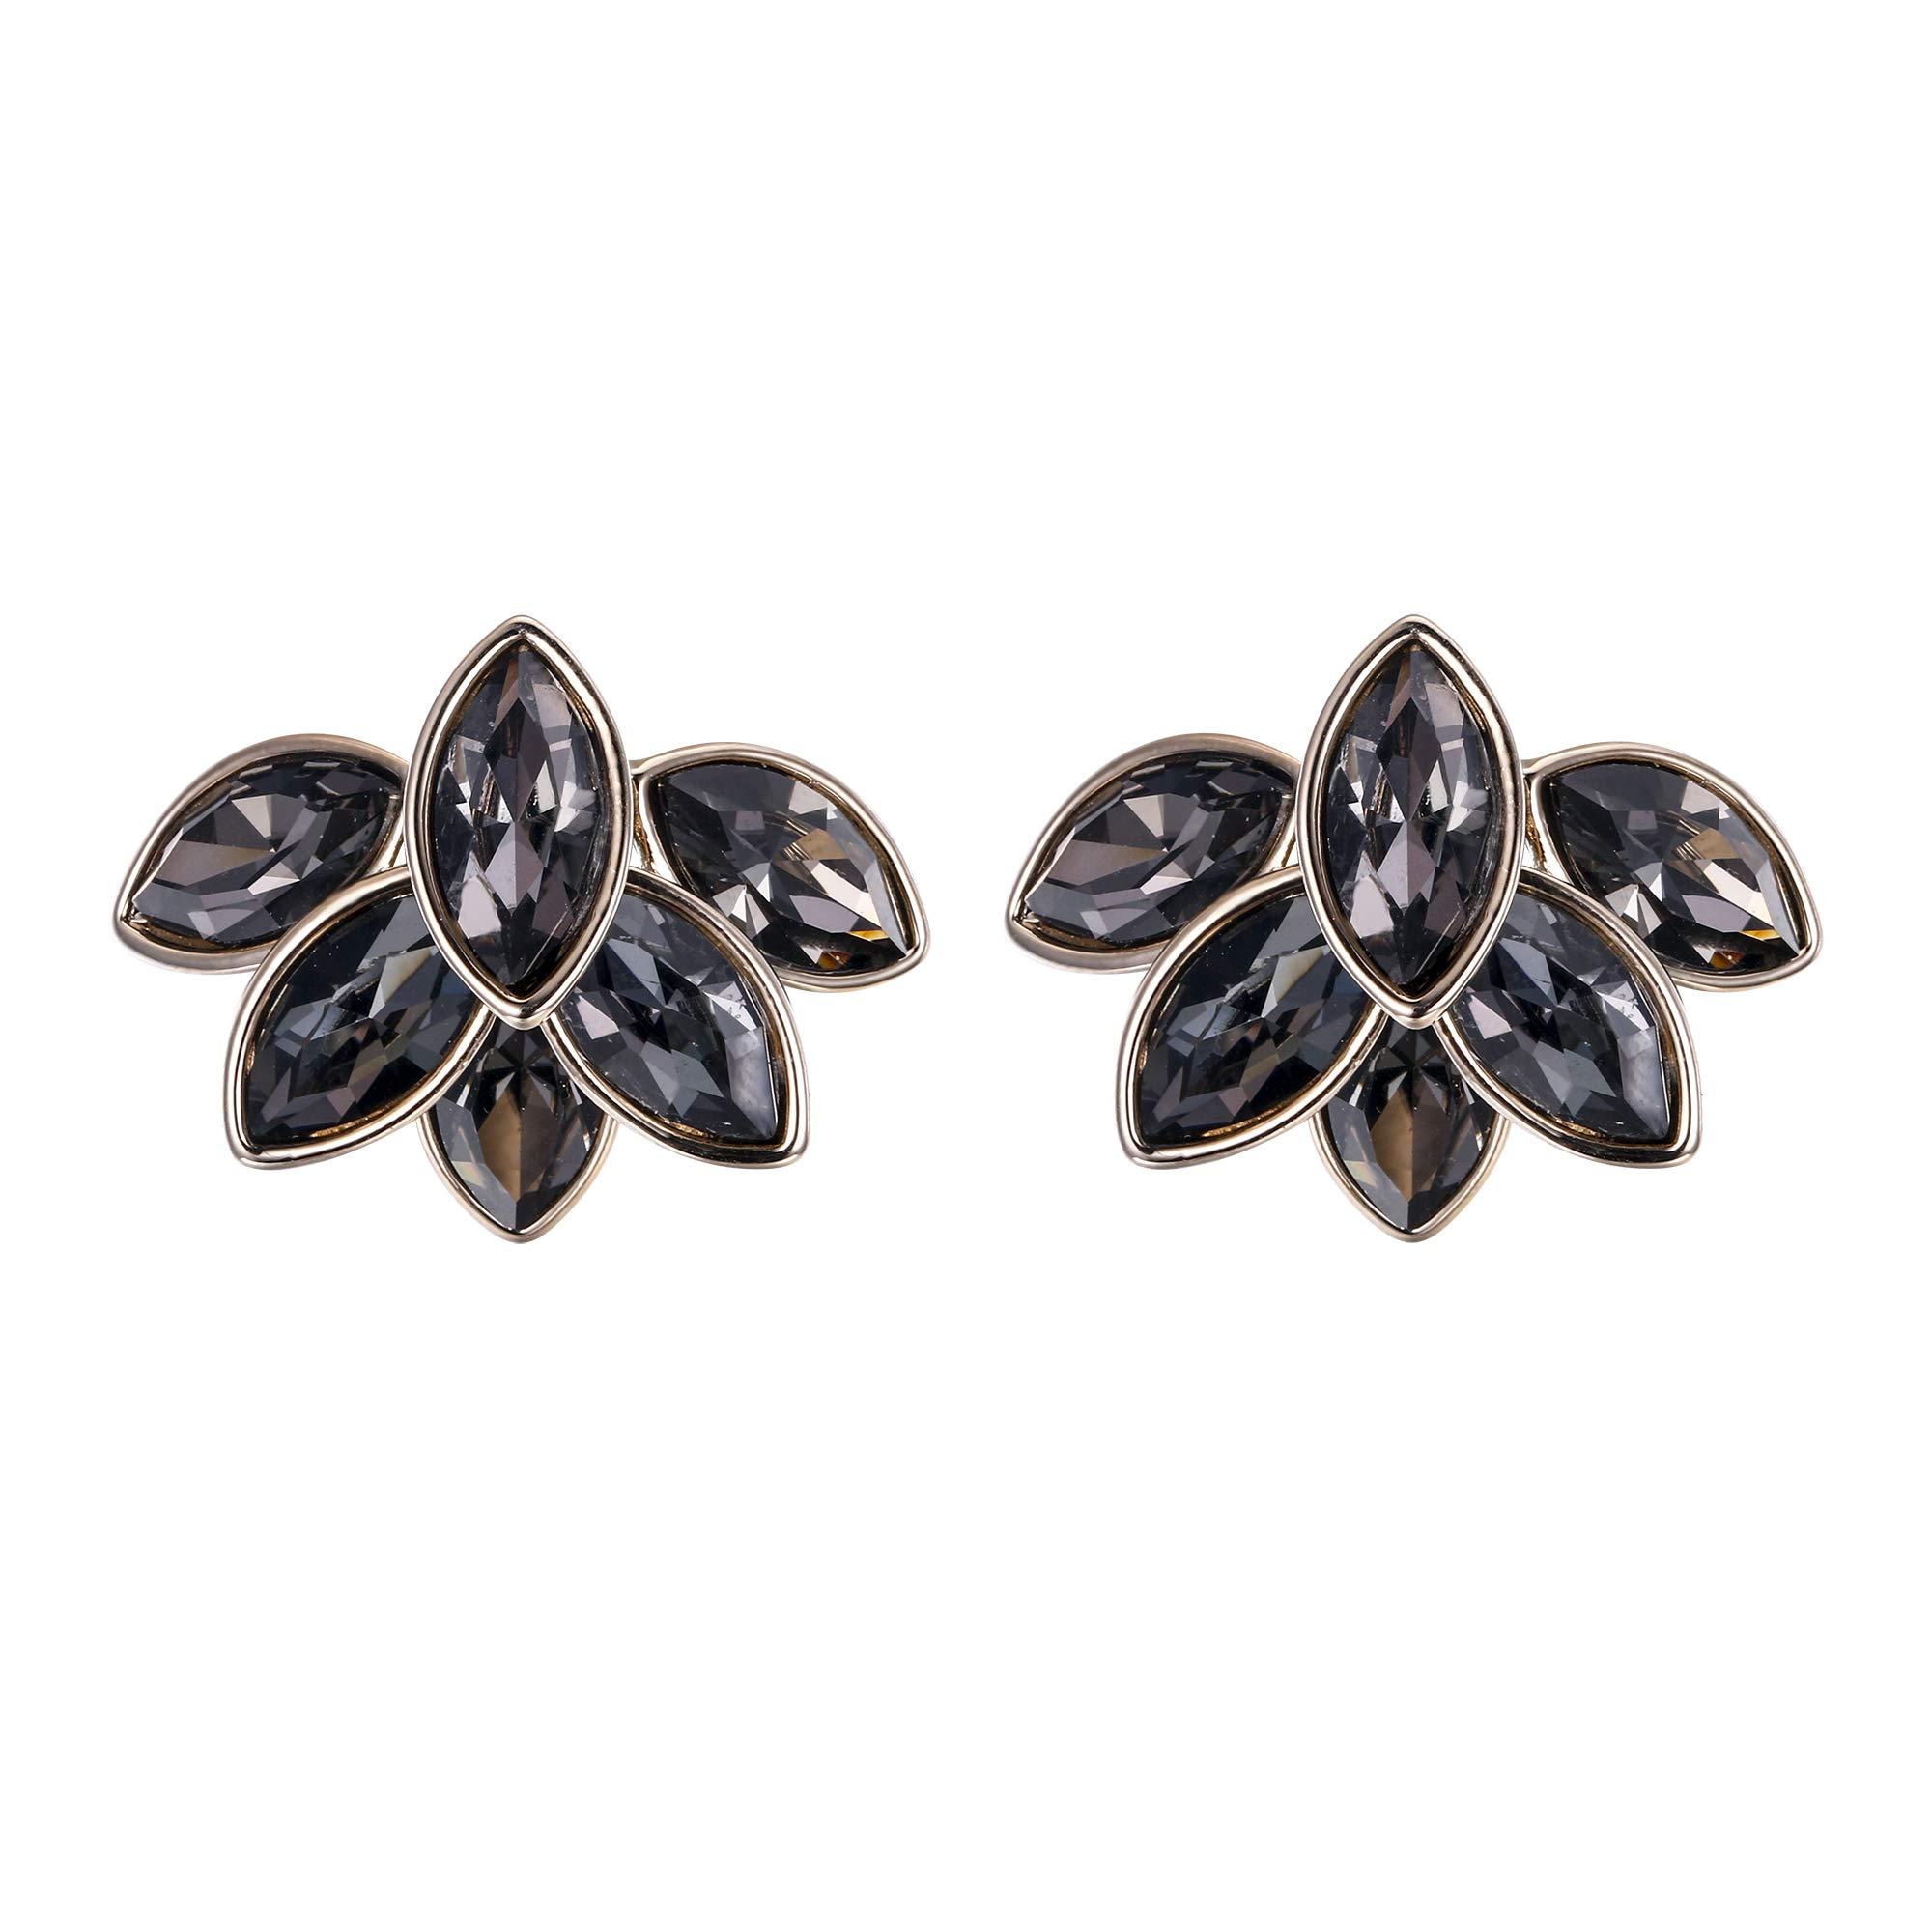 BriLove Women's Wedding Bridal Crystal Multi Marquise-Cut Leaf Ear Jacket Earrings Grey Black Gold-Toned